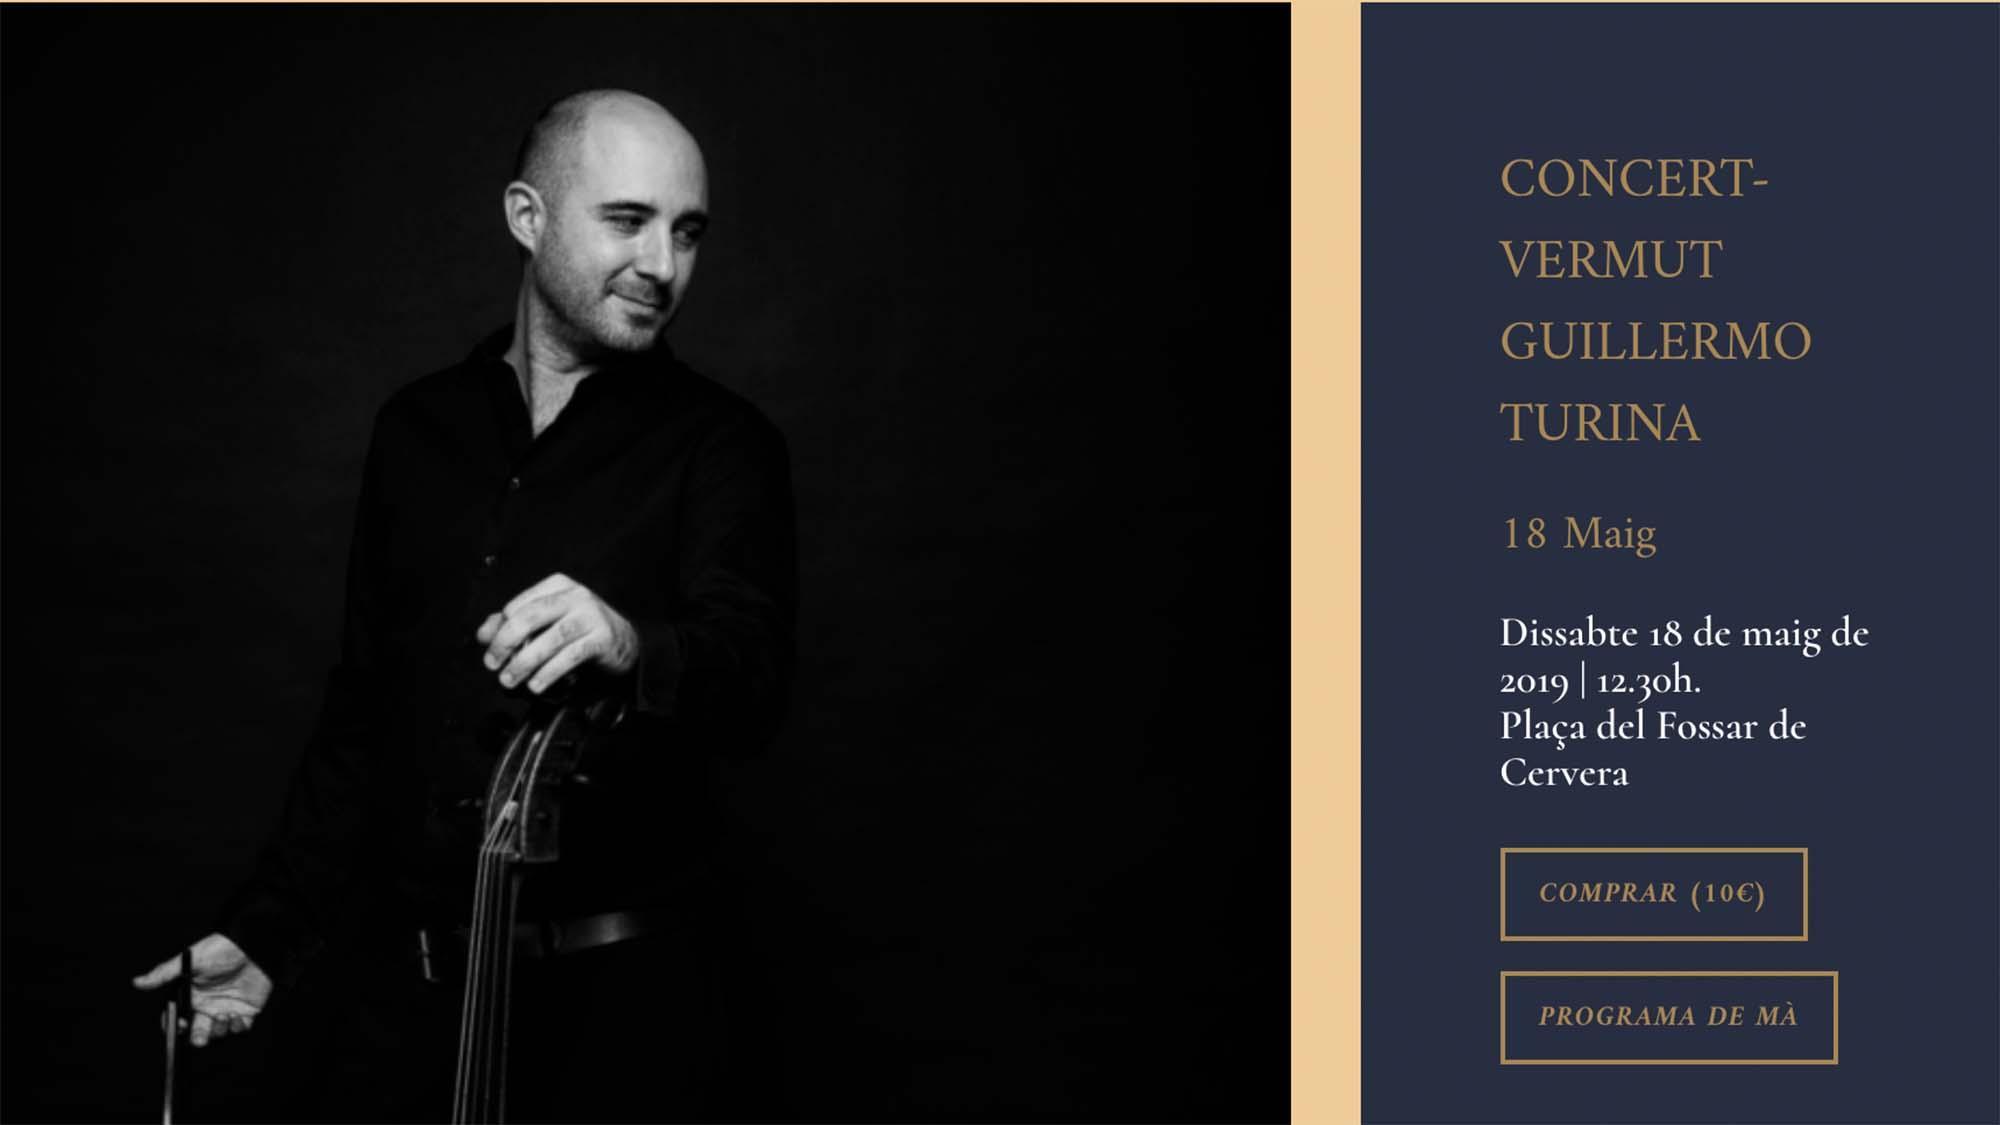 Concert-Vermut Guillermo Turina